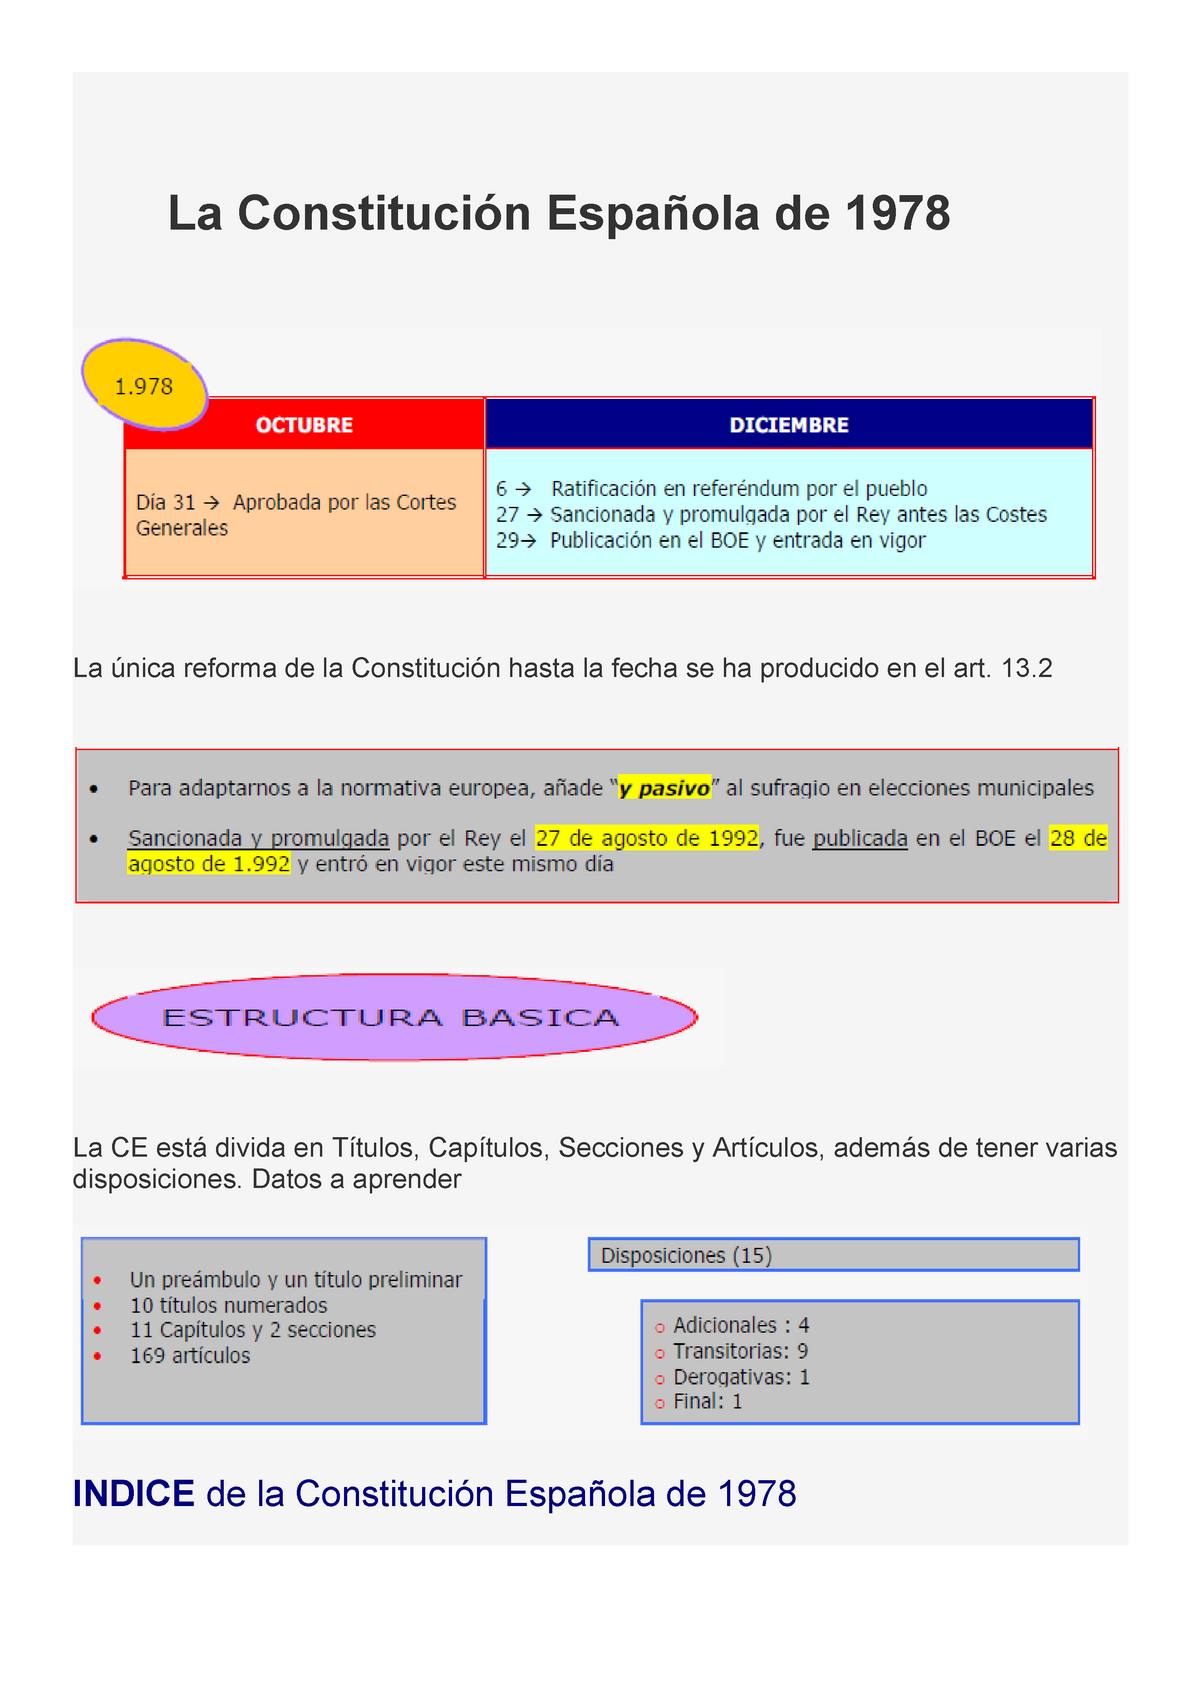 La Constitucion Esquemas 66022055 Uned Studocu